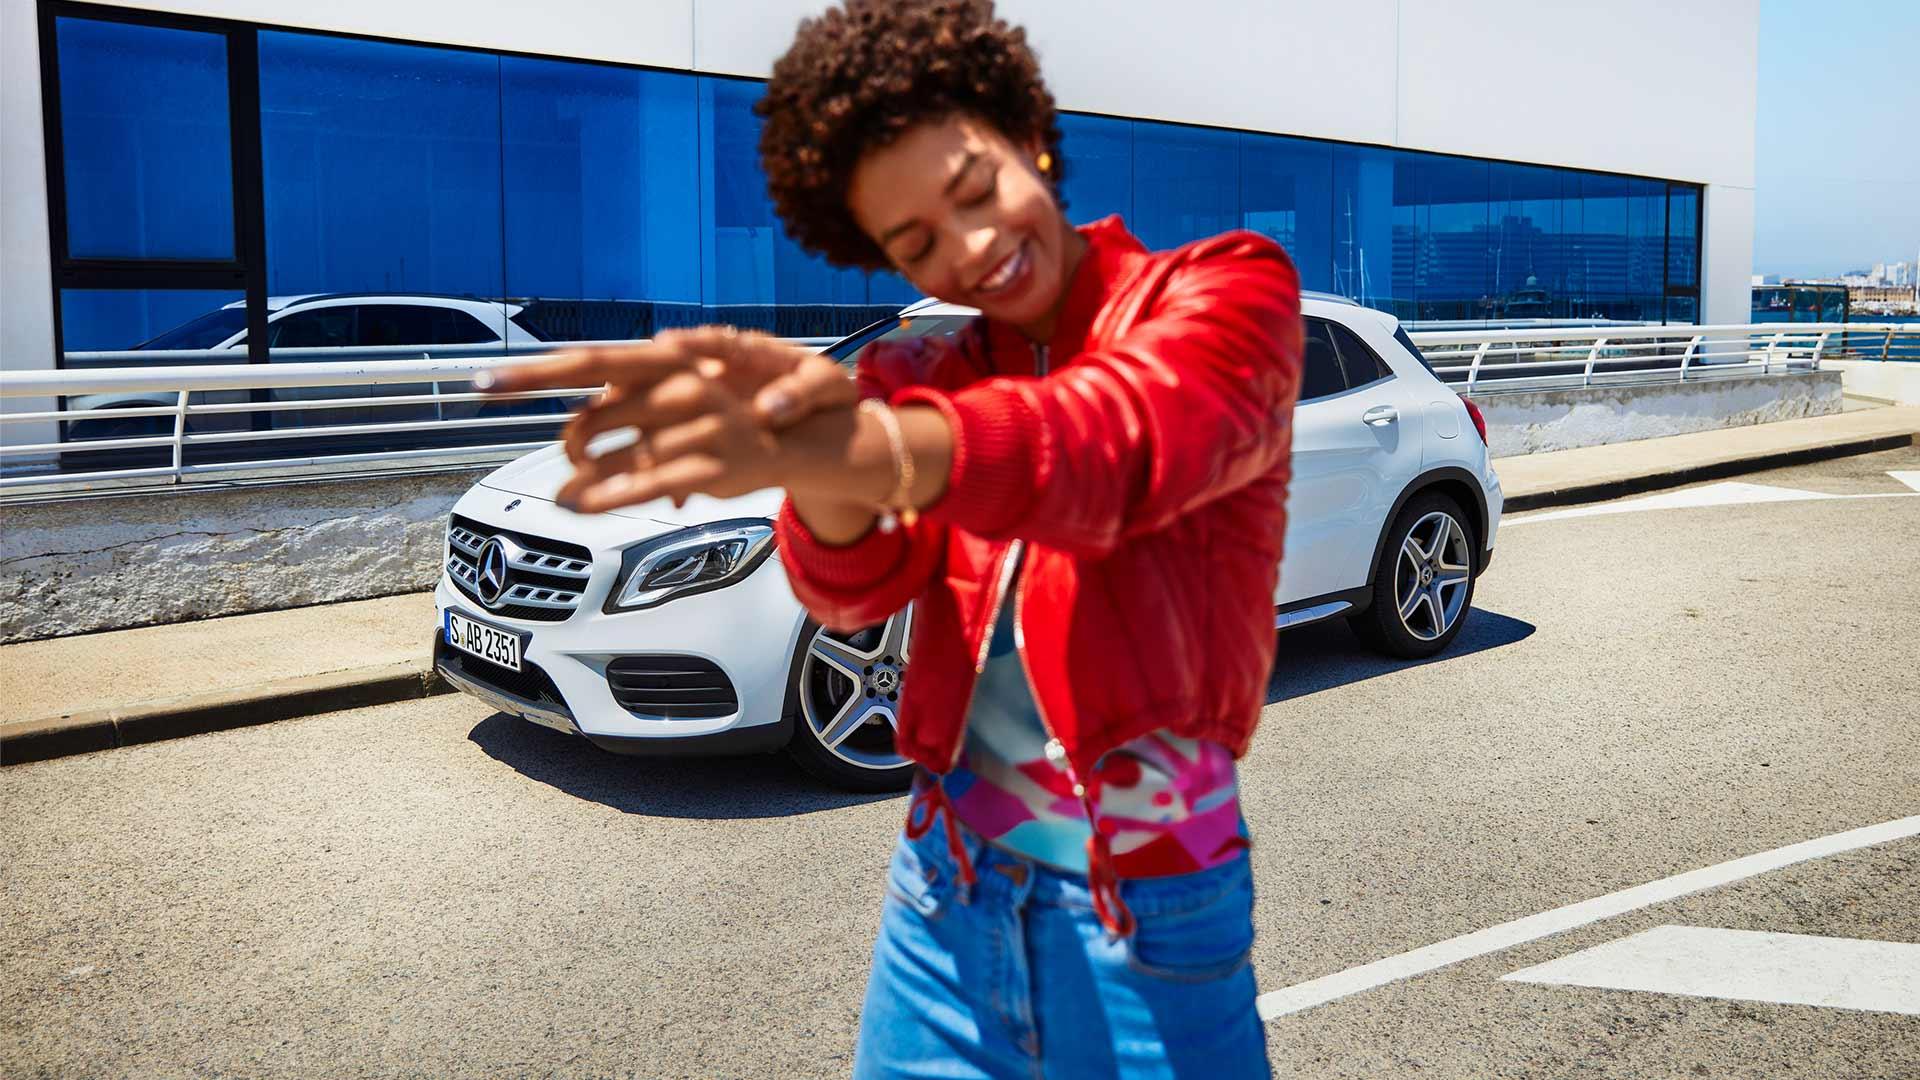 Mercedes-Benz Global Service & Parts - Entwicklung Bildwelt